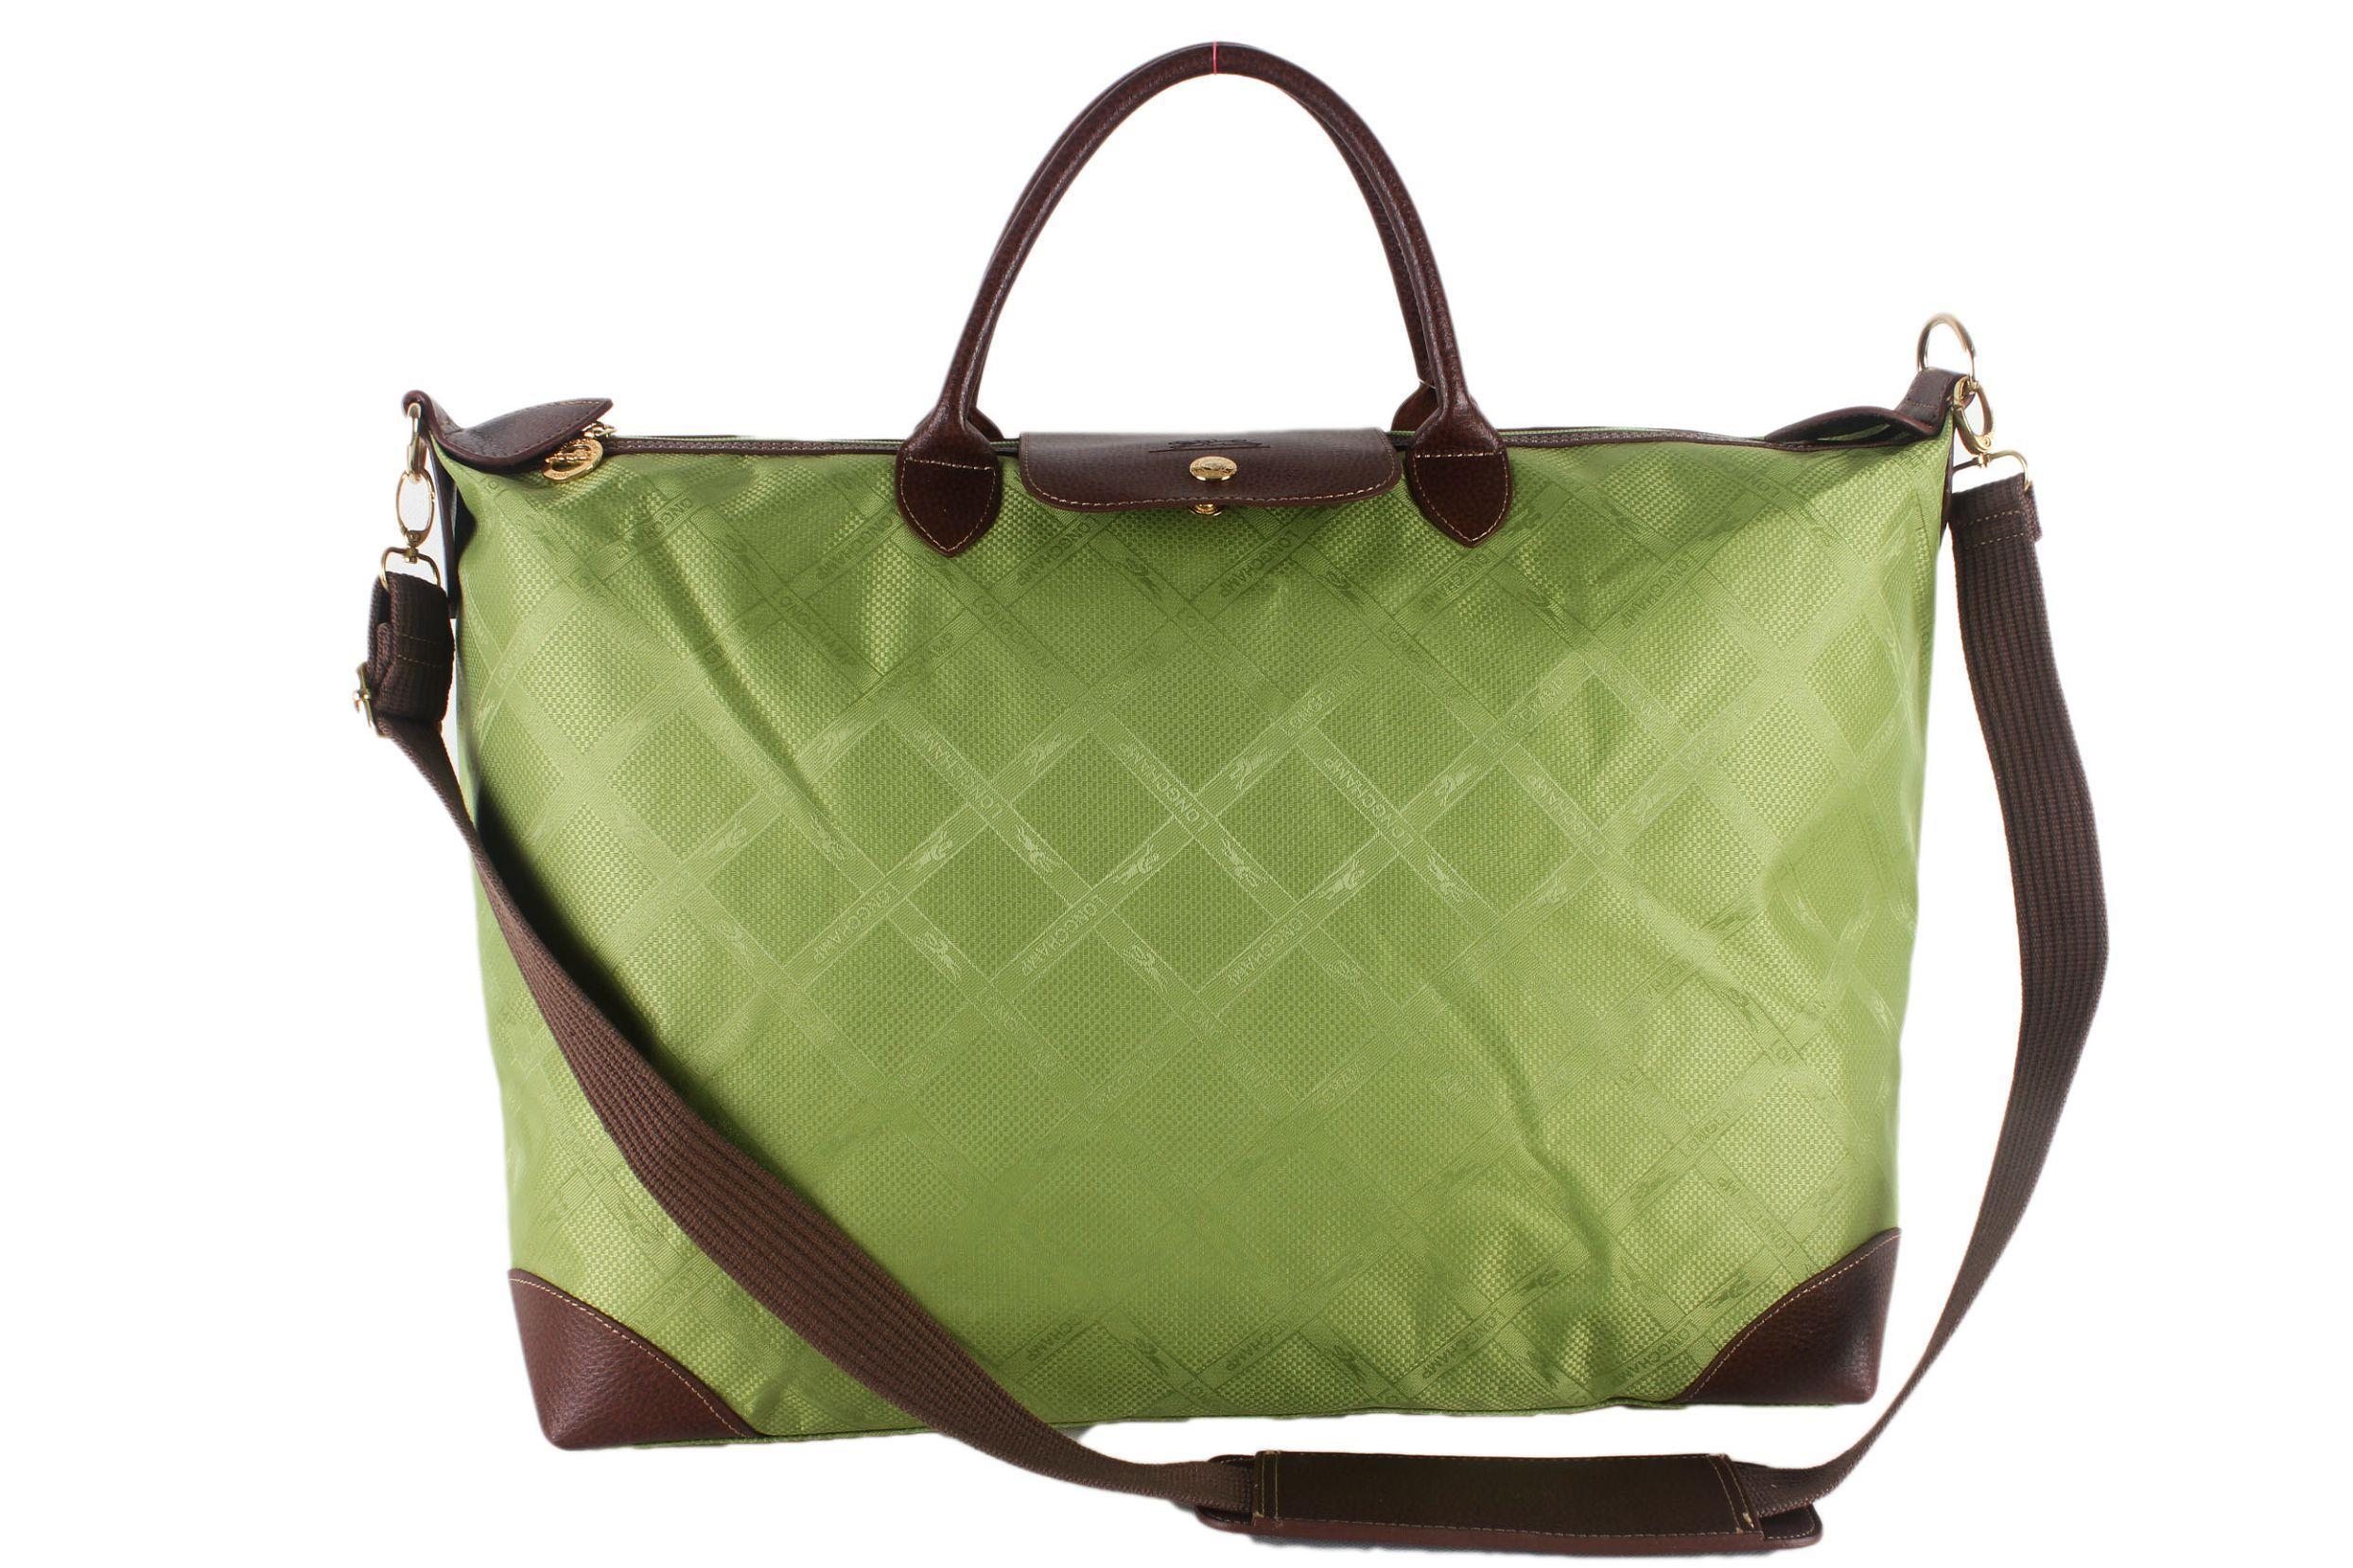 Longchamp bags online shop uk fenix toulouse handball jpg 2488x1658 Long  champ factory outlet online 1e7f1e13f2ad0